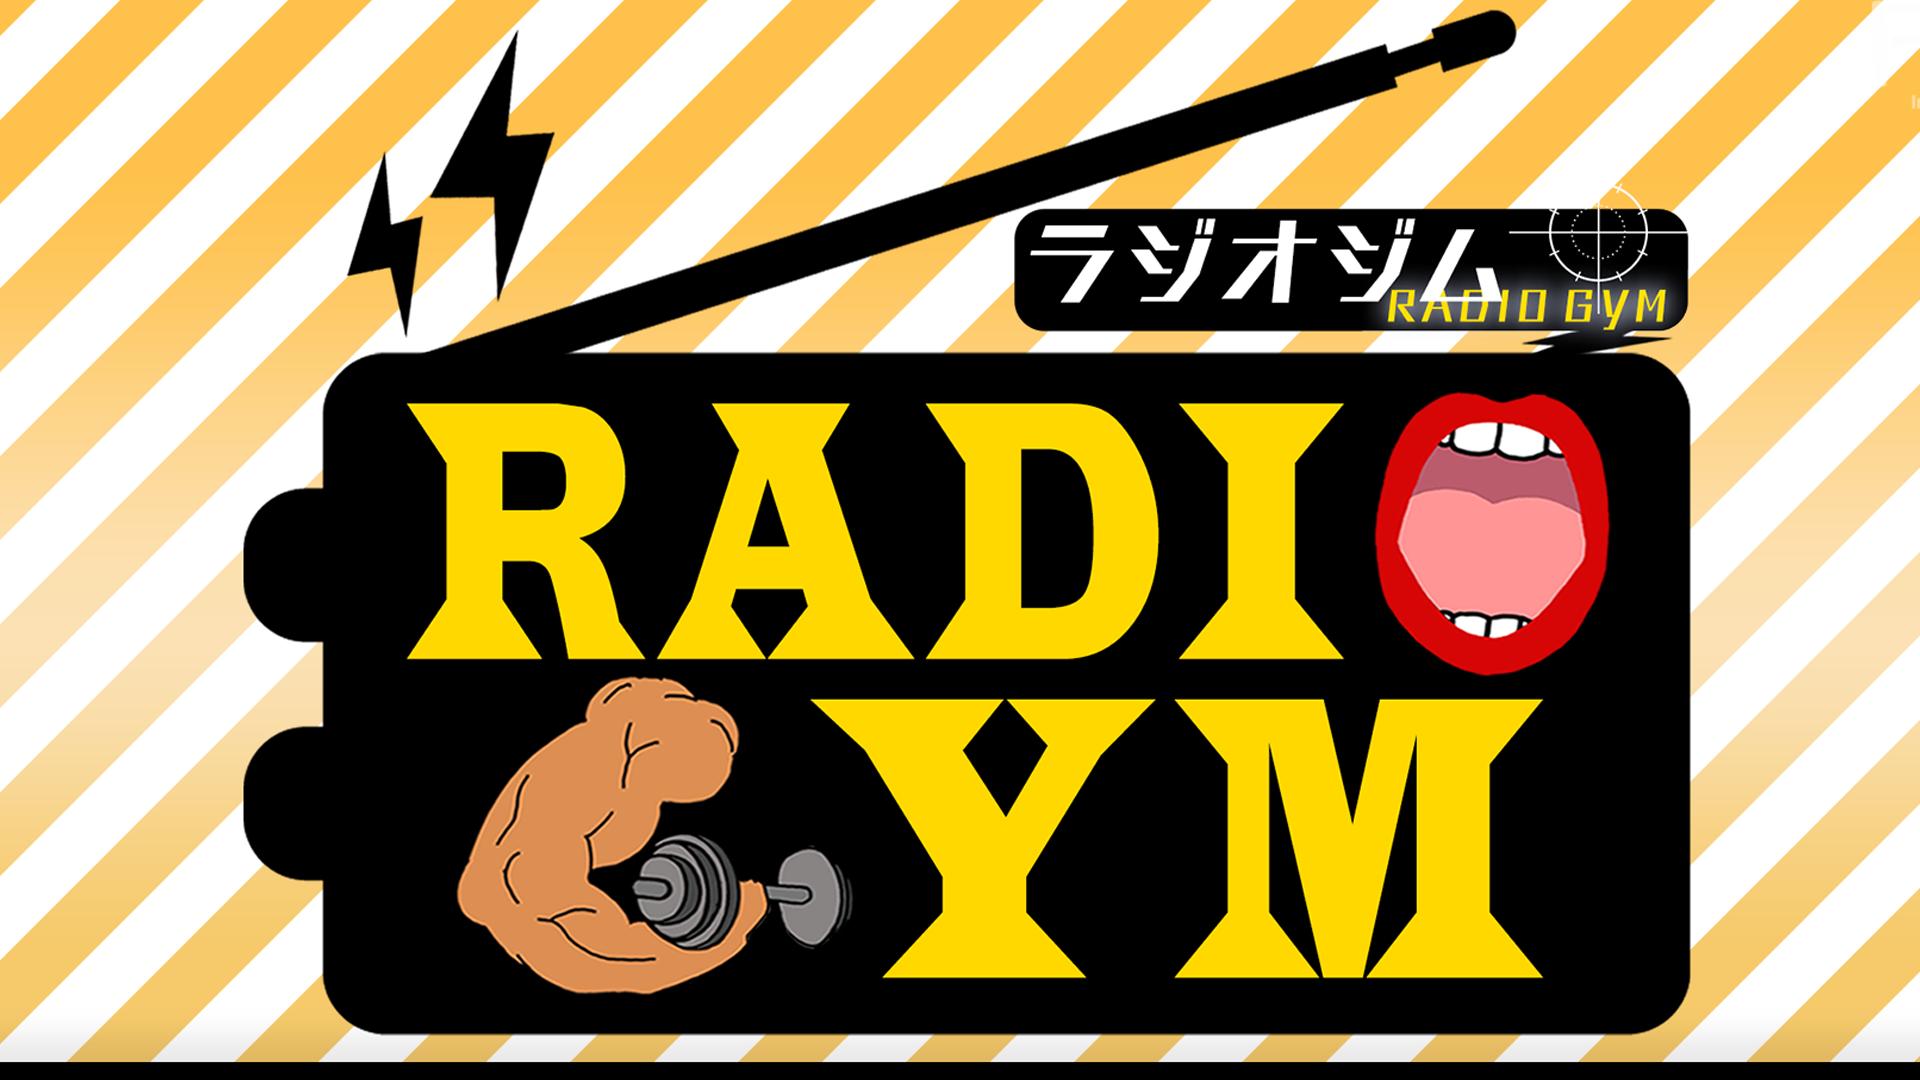 RADIO GYM